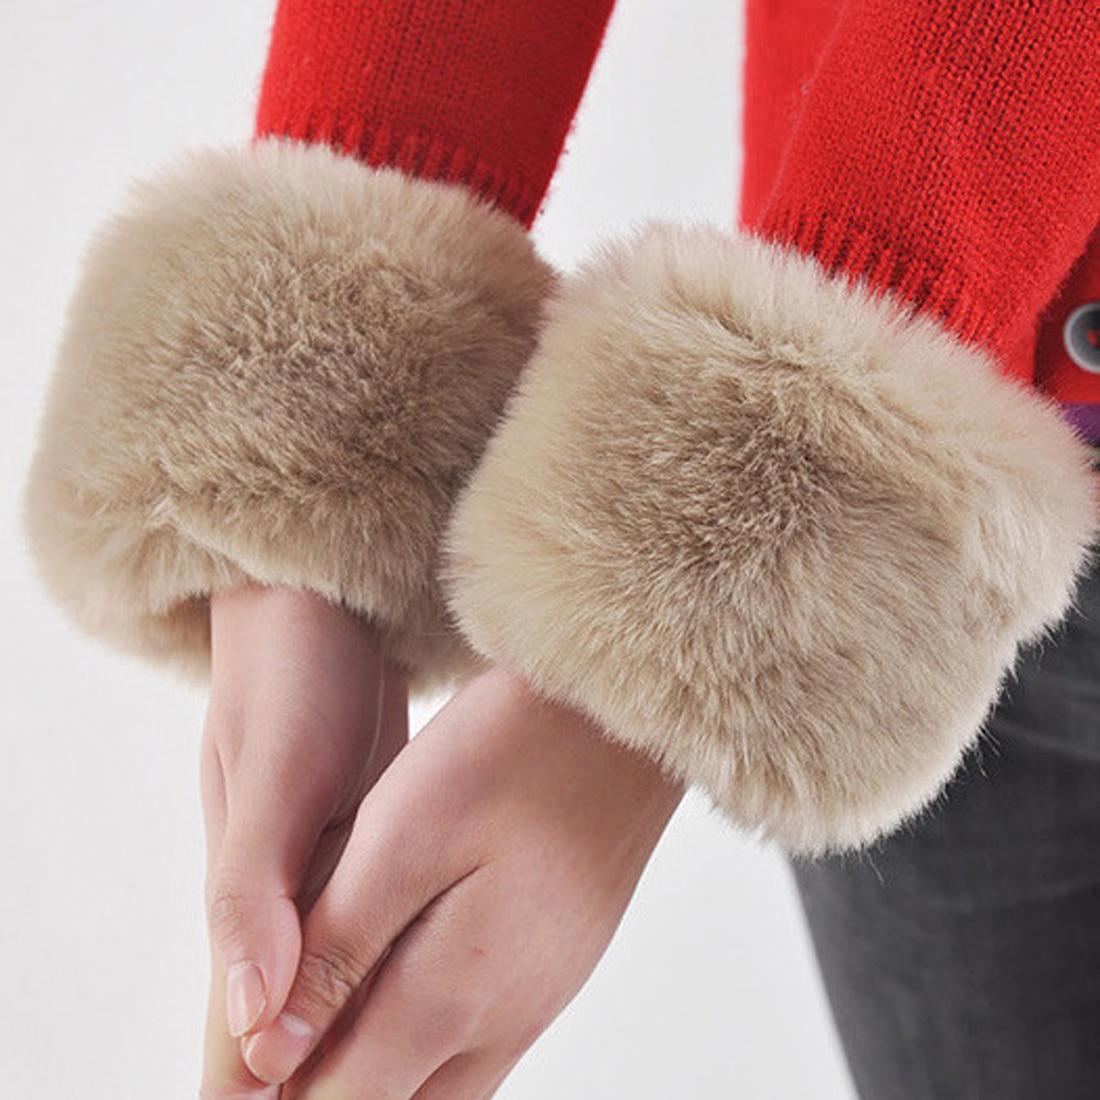 Winter Ladies Arm Warmer Faux Fur Wrist Slap On Cuffs Women Warm Fashion Warmer Cuffs Arm Warmers Wraps Plush Wrist Protector